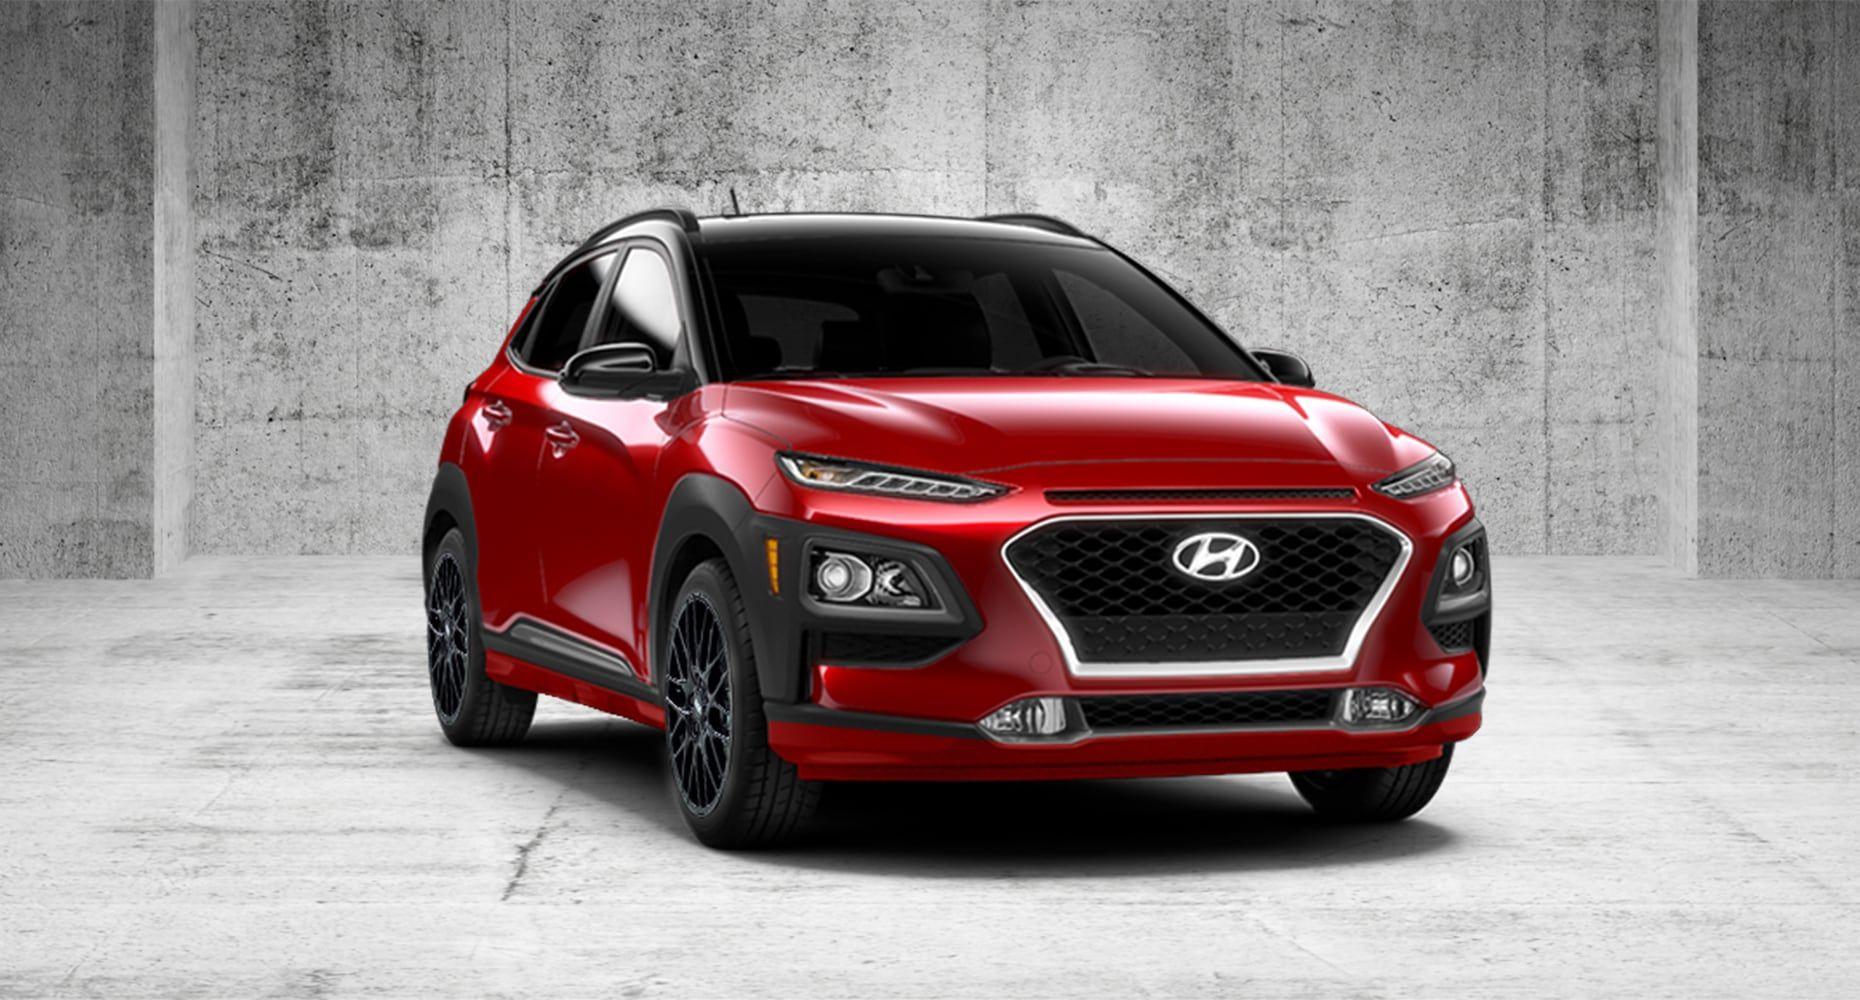 2021 Hyundai Kona Suv Crossover Utility Vehicle Hyundai Canada In 2020 Suv Hyundai Canada Hyundai